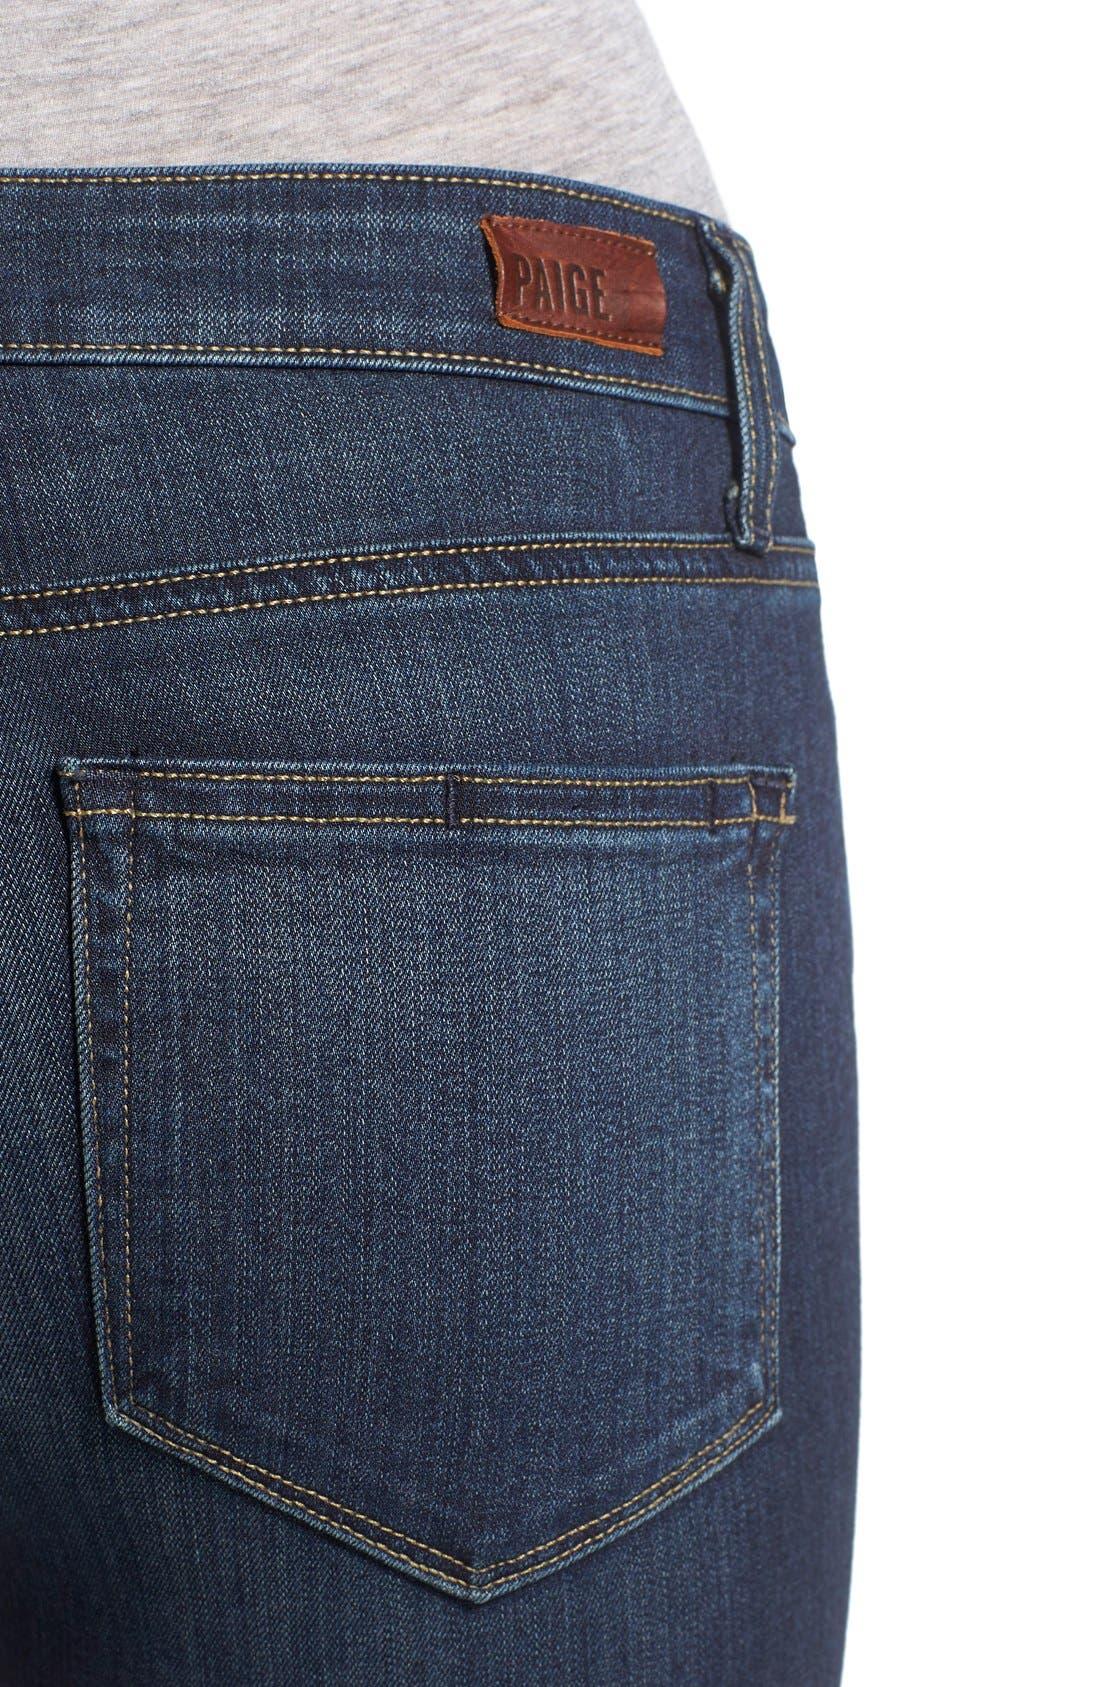 Alternate Image 4  - Paige Denim 'Transcend - Verdugo' Ankle Ultra Skinny Jeans (Nottingham) (Petite)